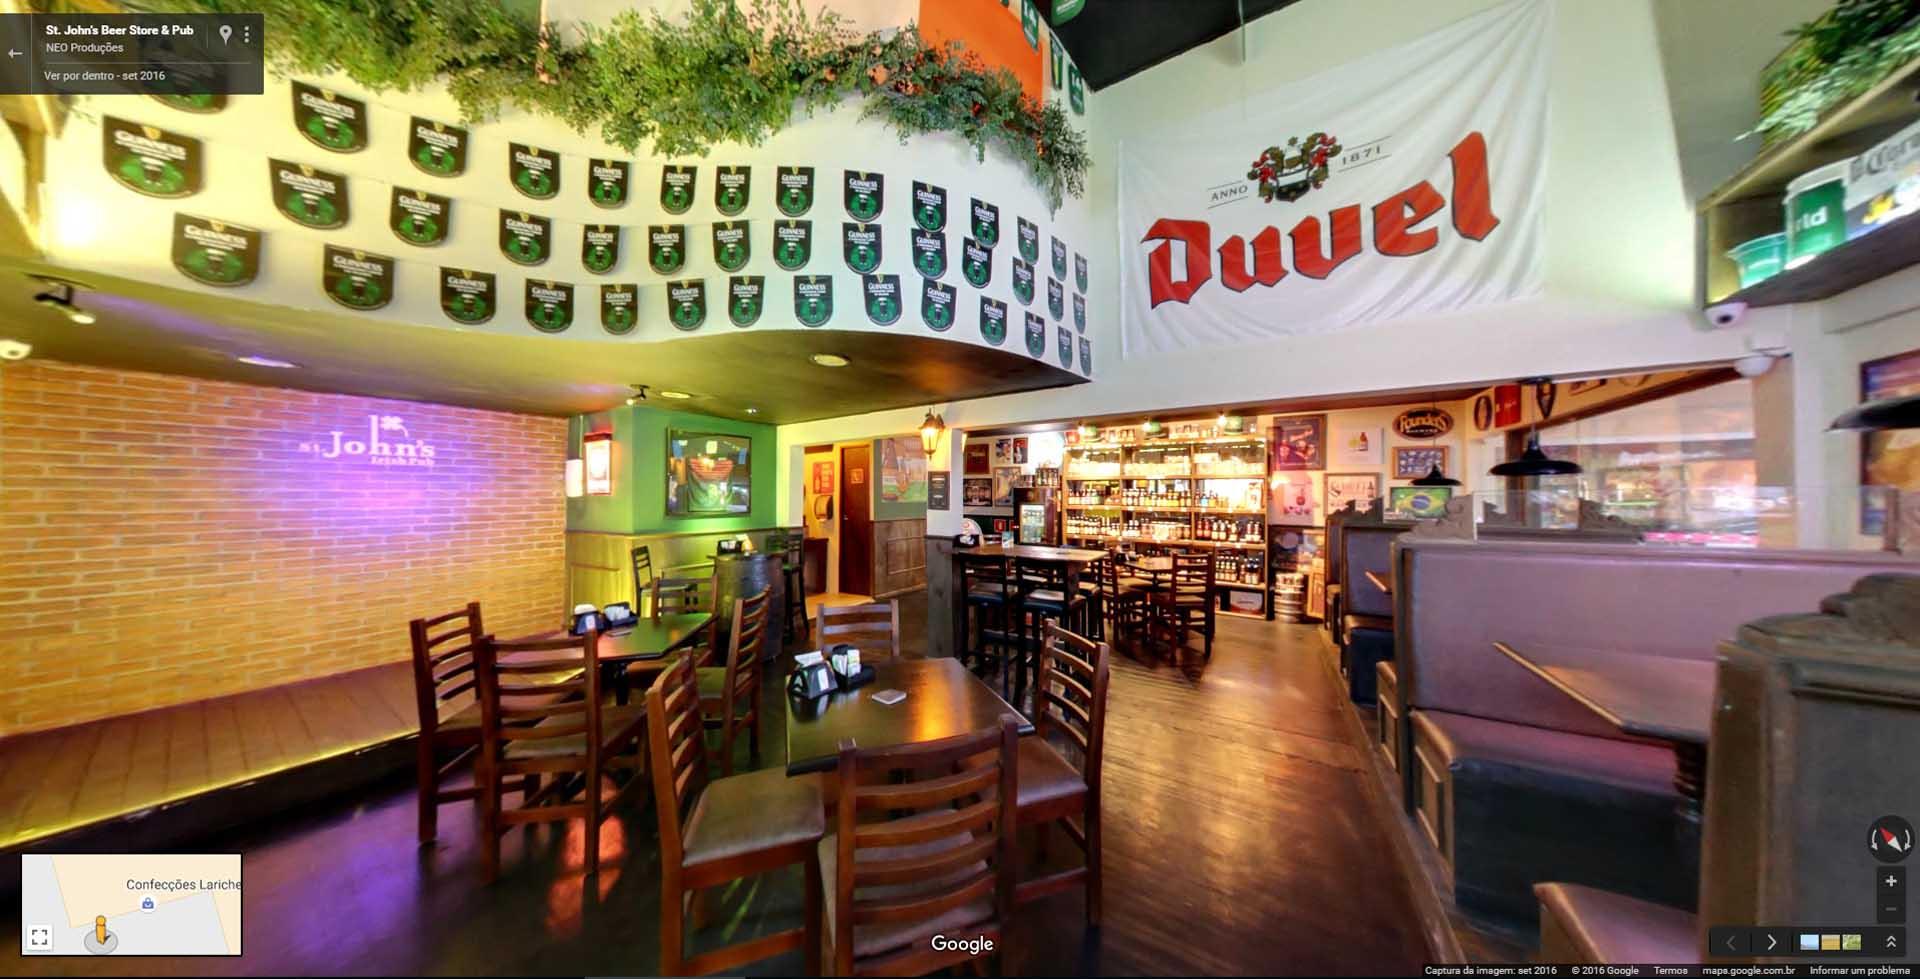 St. John's Beer Store & Pub